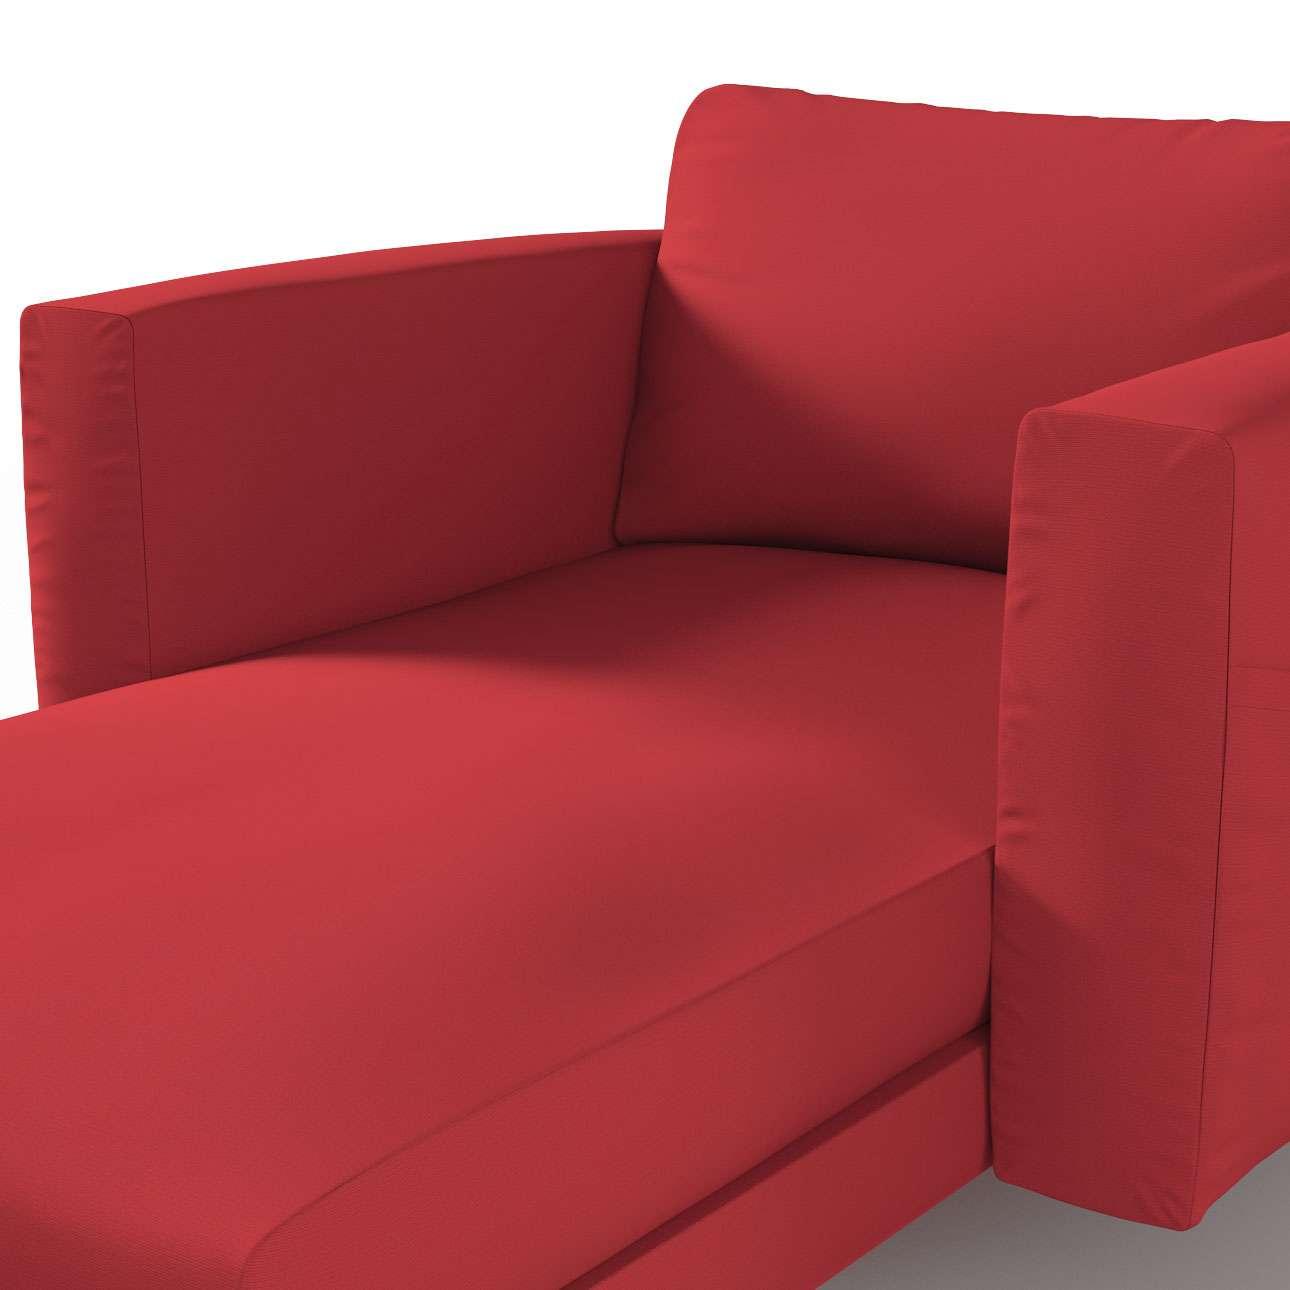 Poťah na sedačku Norsborg s podrúčkami V kolekcii Cotton Panama, tkanina: 702-04